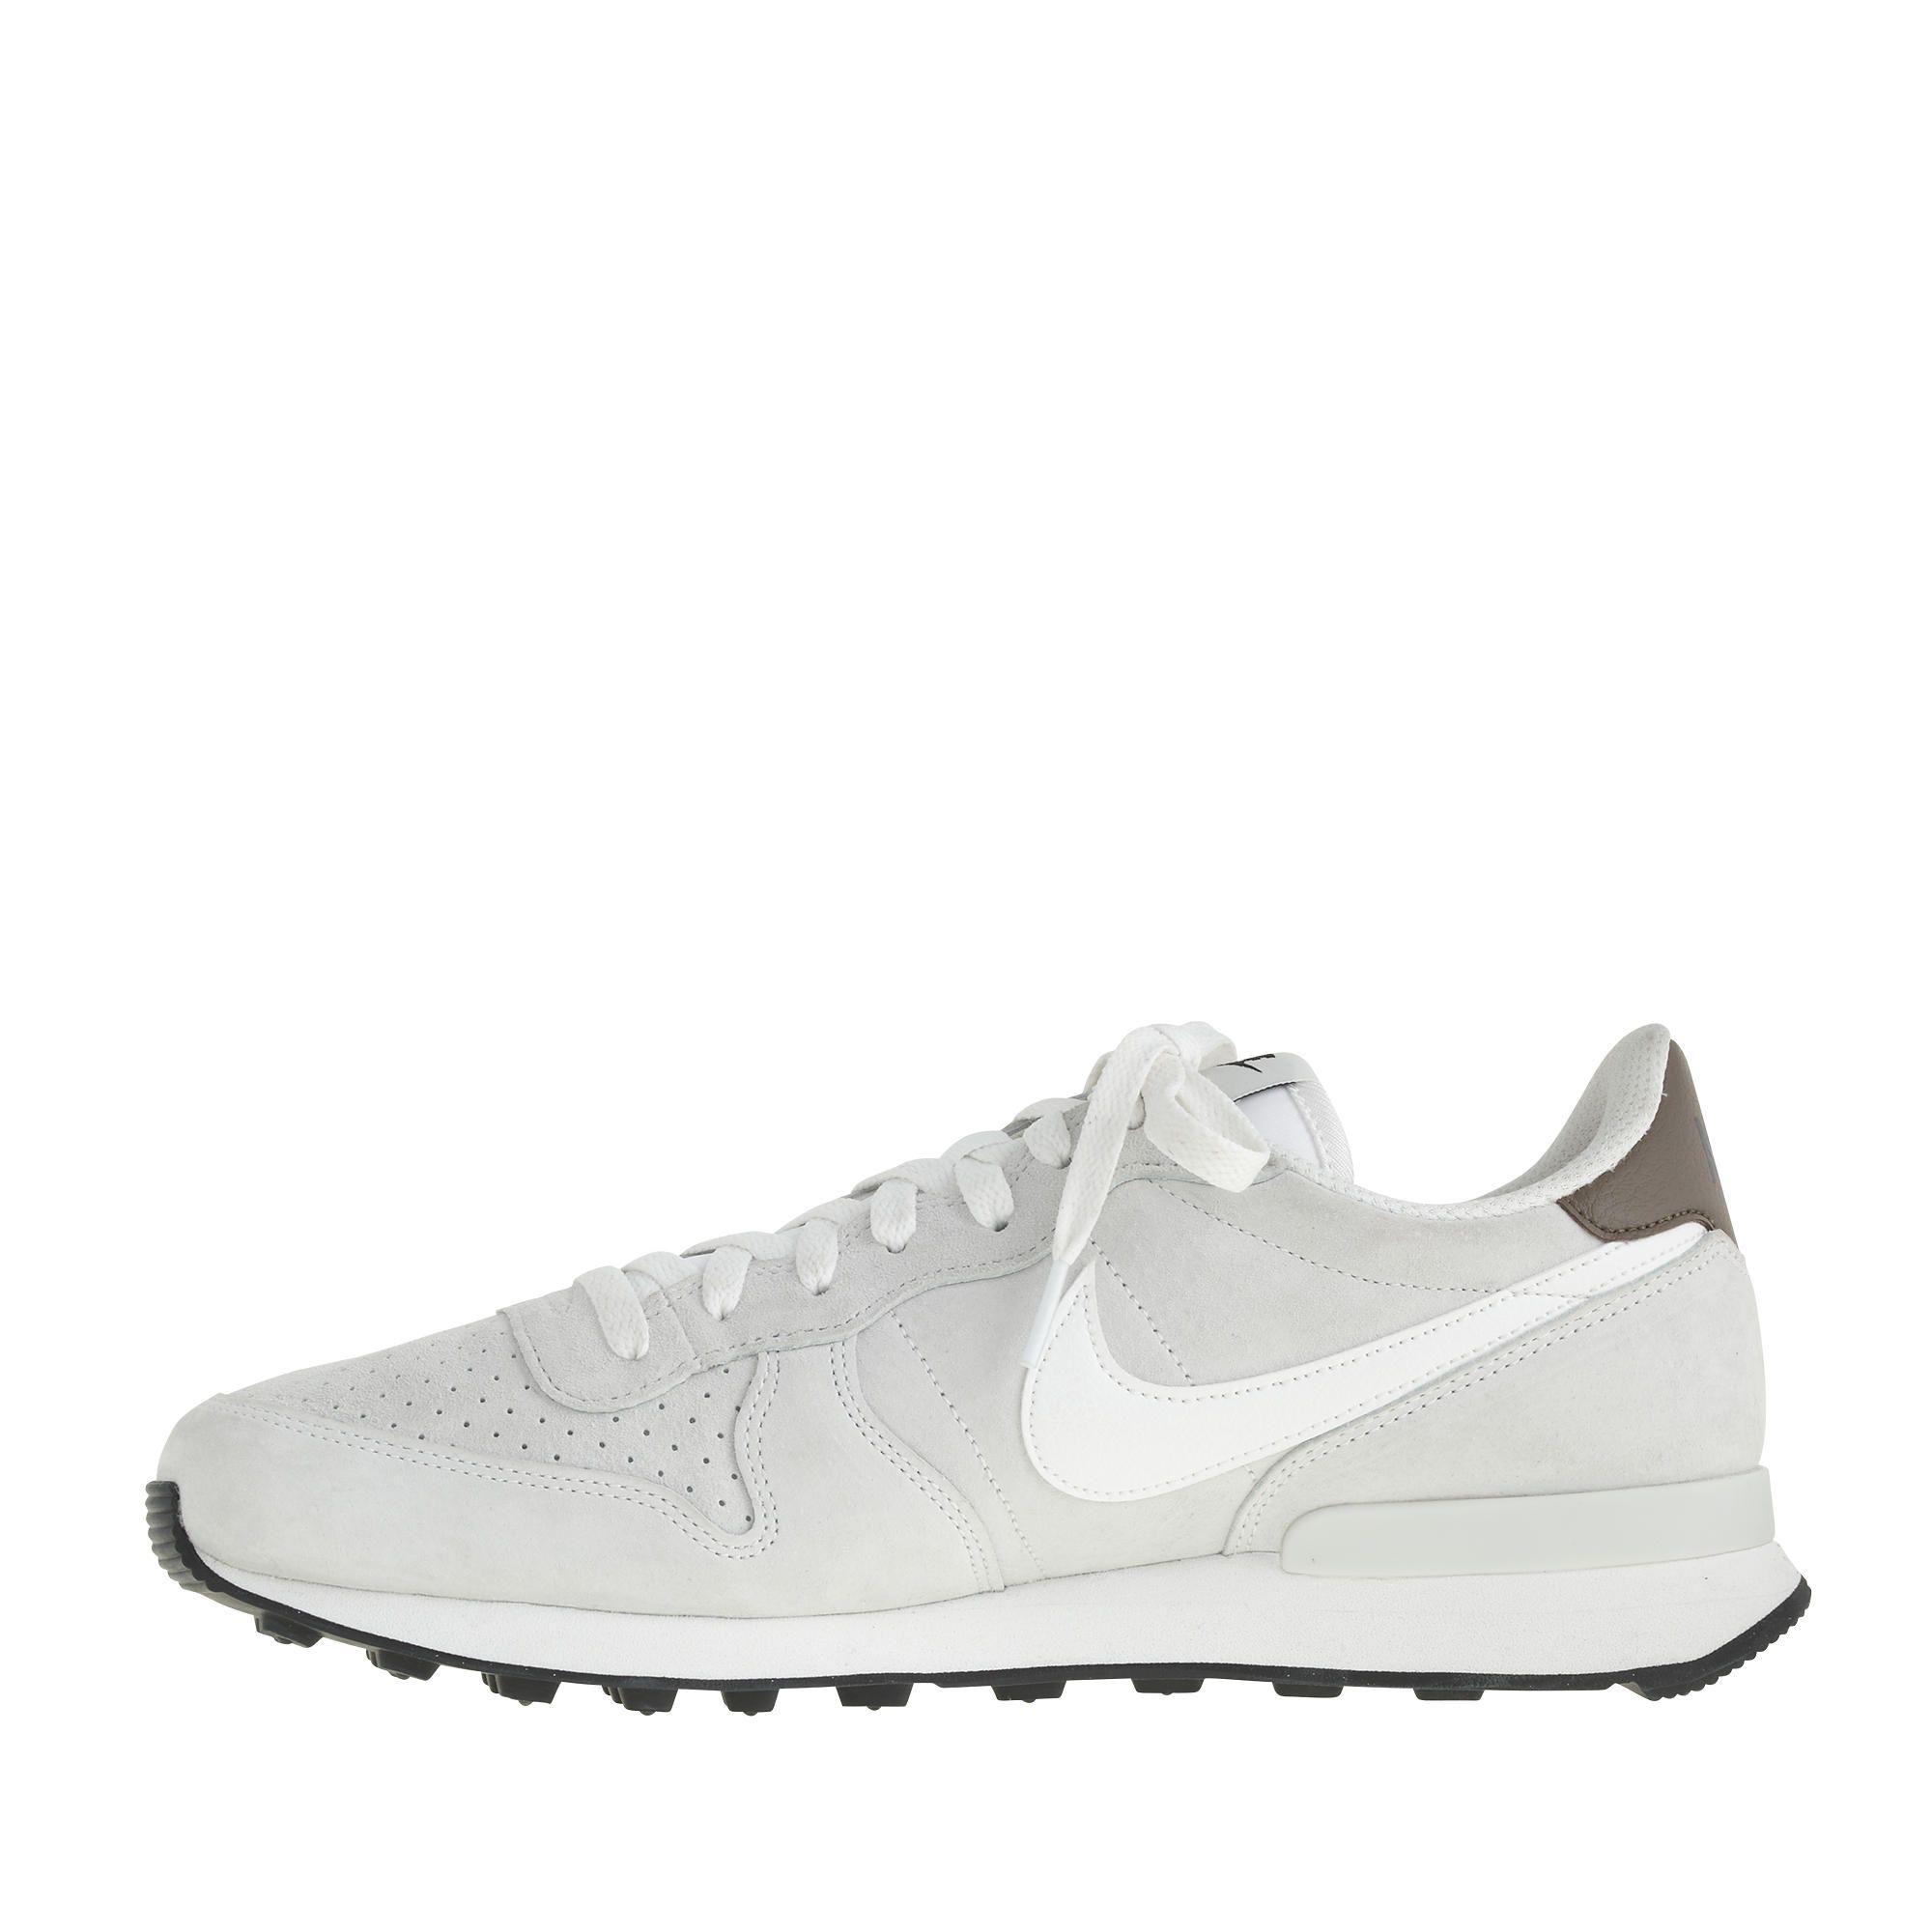 Men's Nike® internationalist premium sneakers